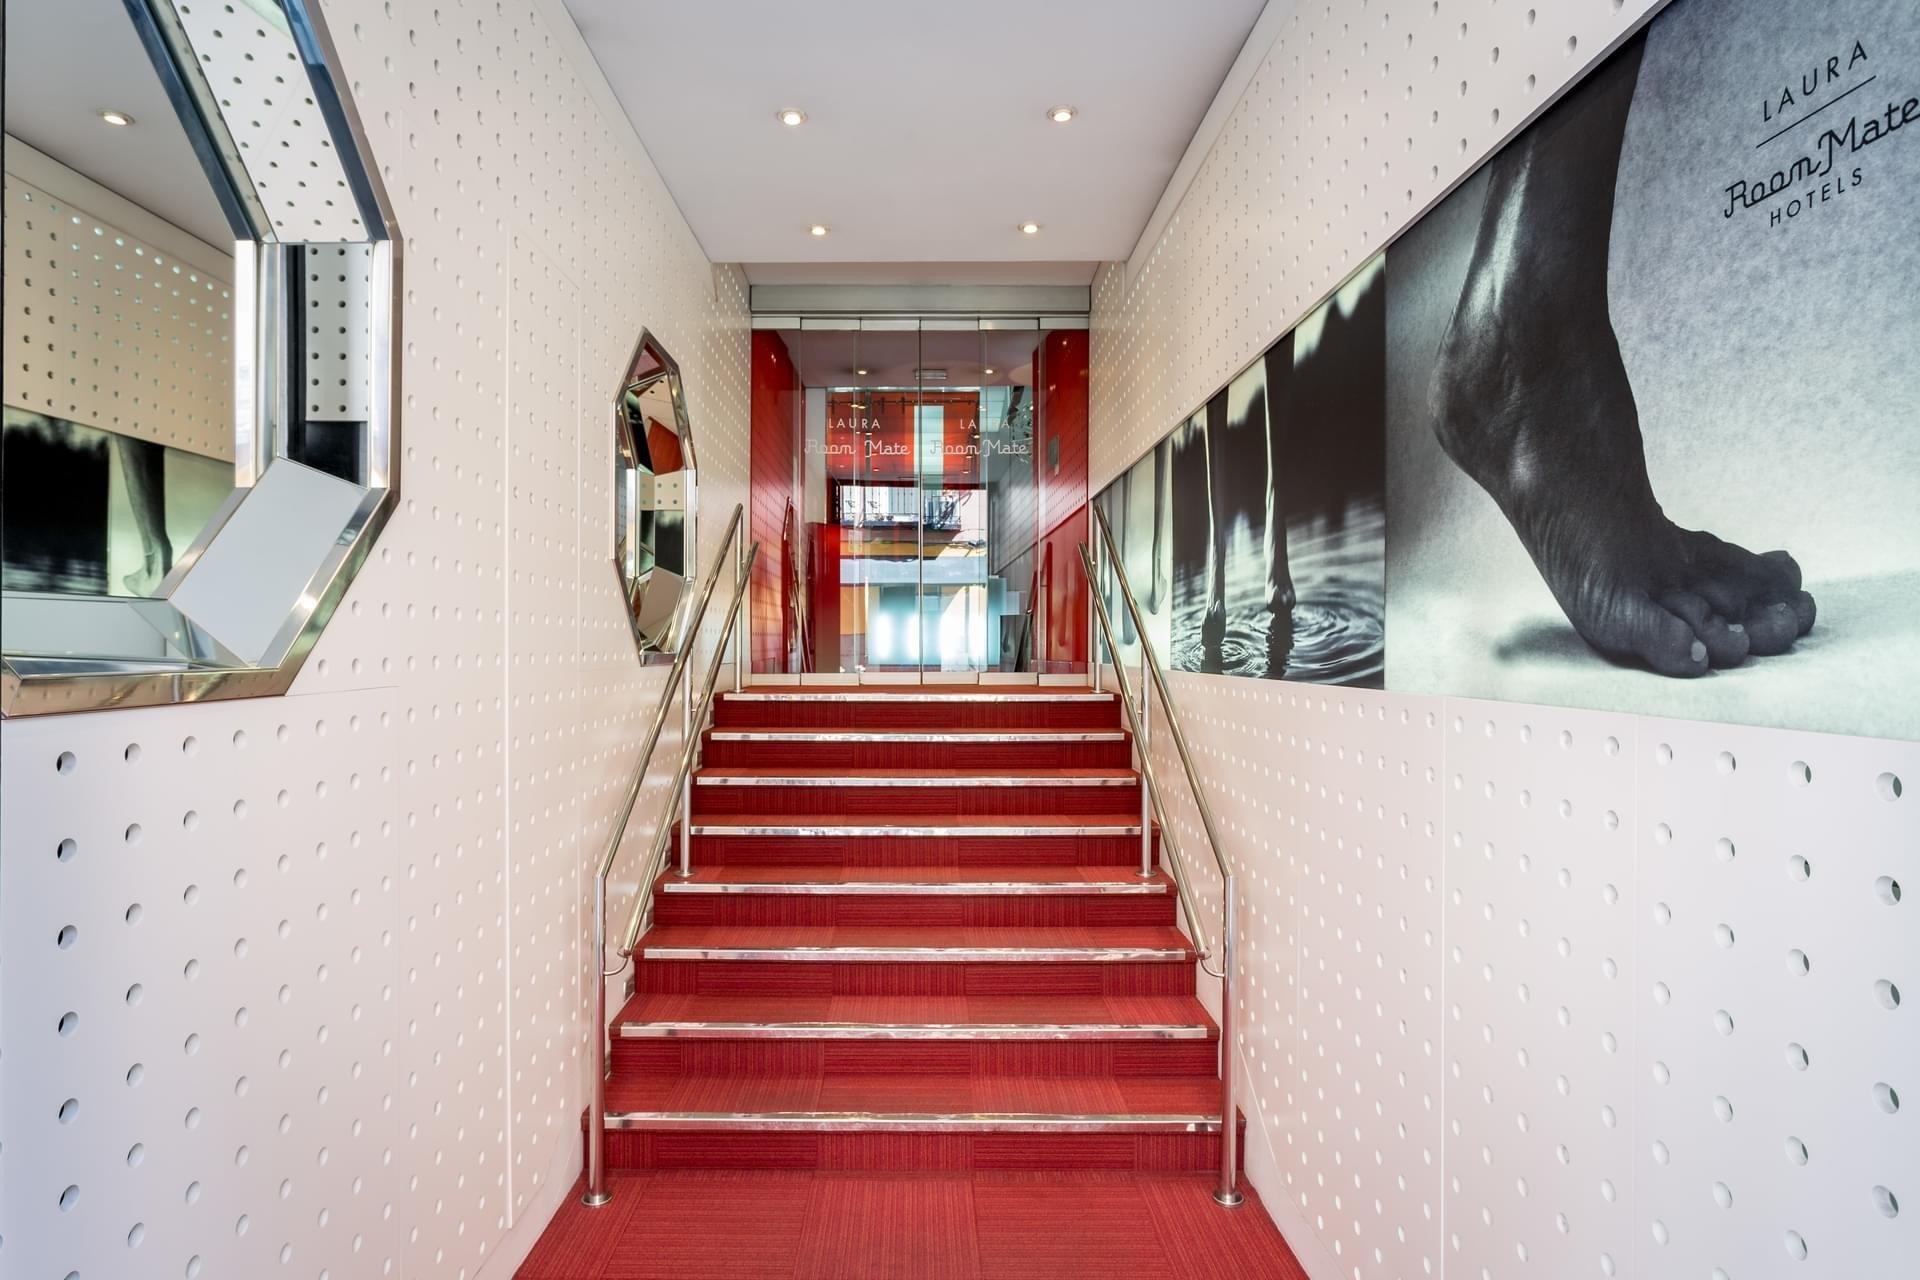 Hotels indoor room interior design Design hall step